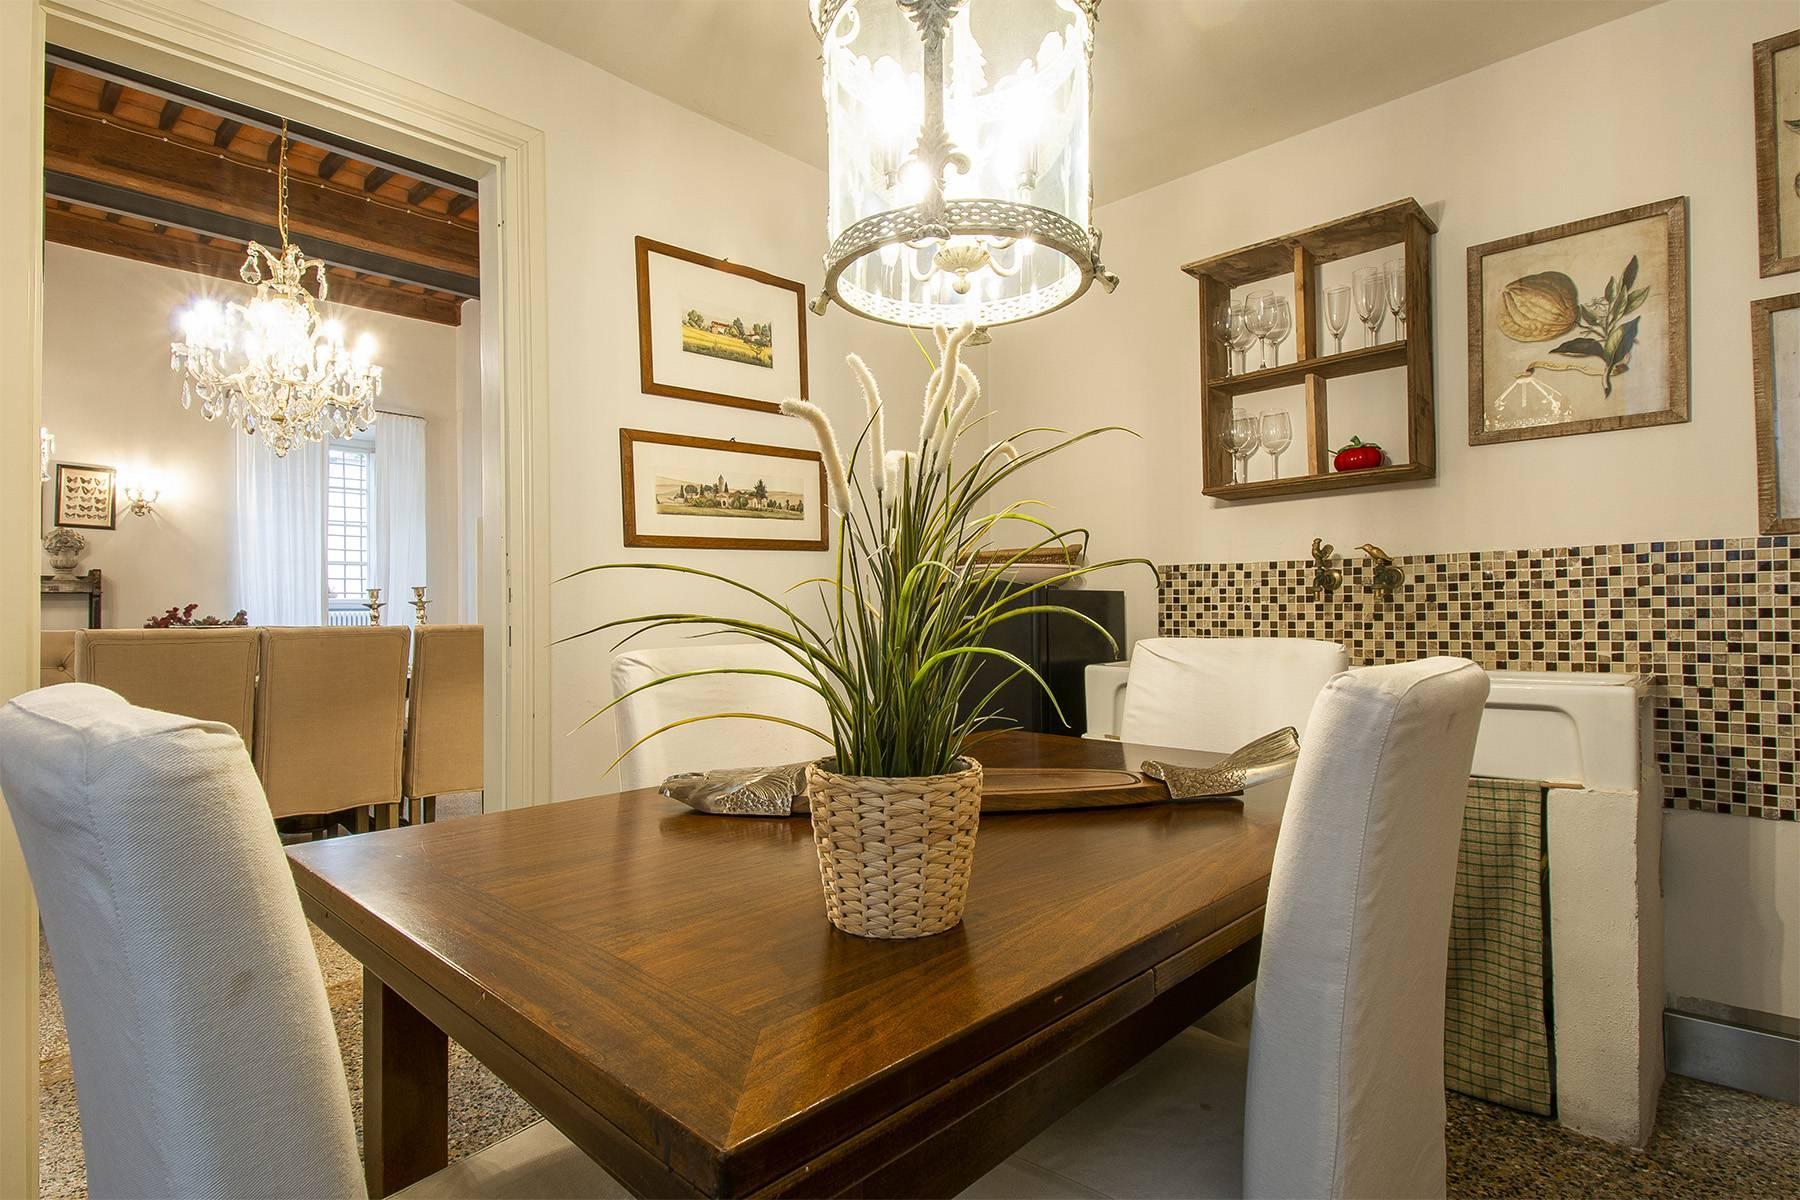 Appartement exclusif au coeur de Lucca - 8